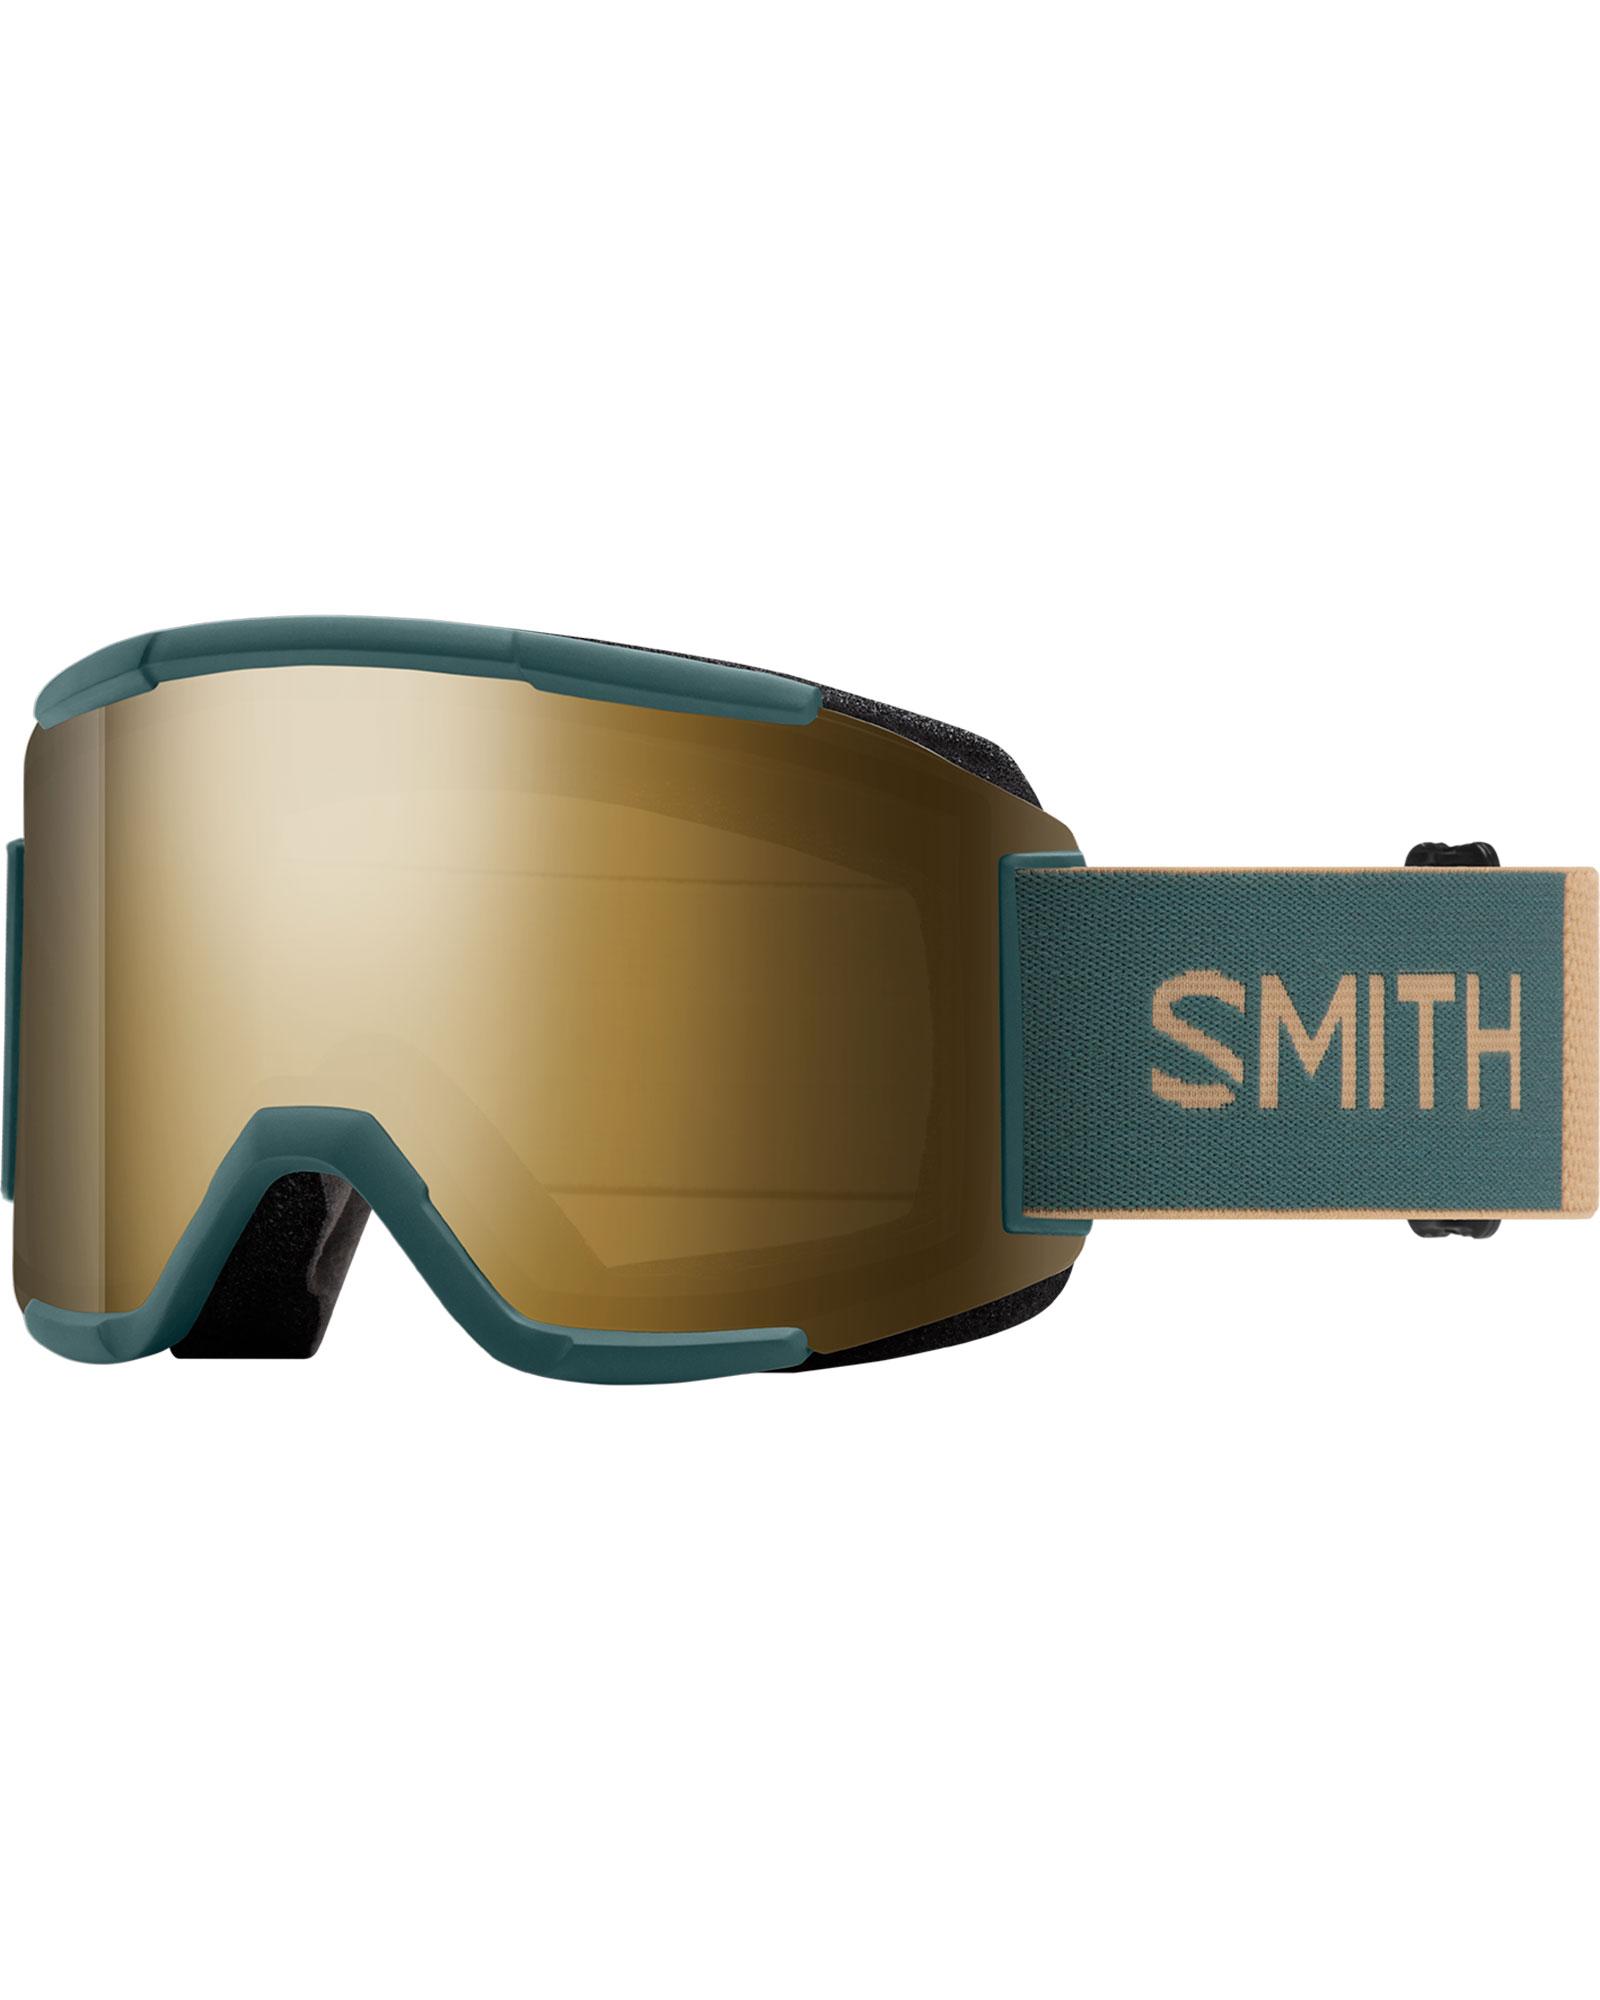 Smith Squad Spruce/Safari / ChromaPop Sun Black Gold Mirror + Yellow Goggles 2020 / 2021 0